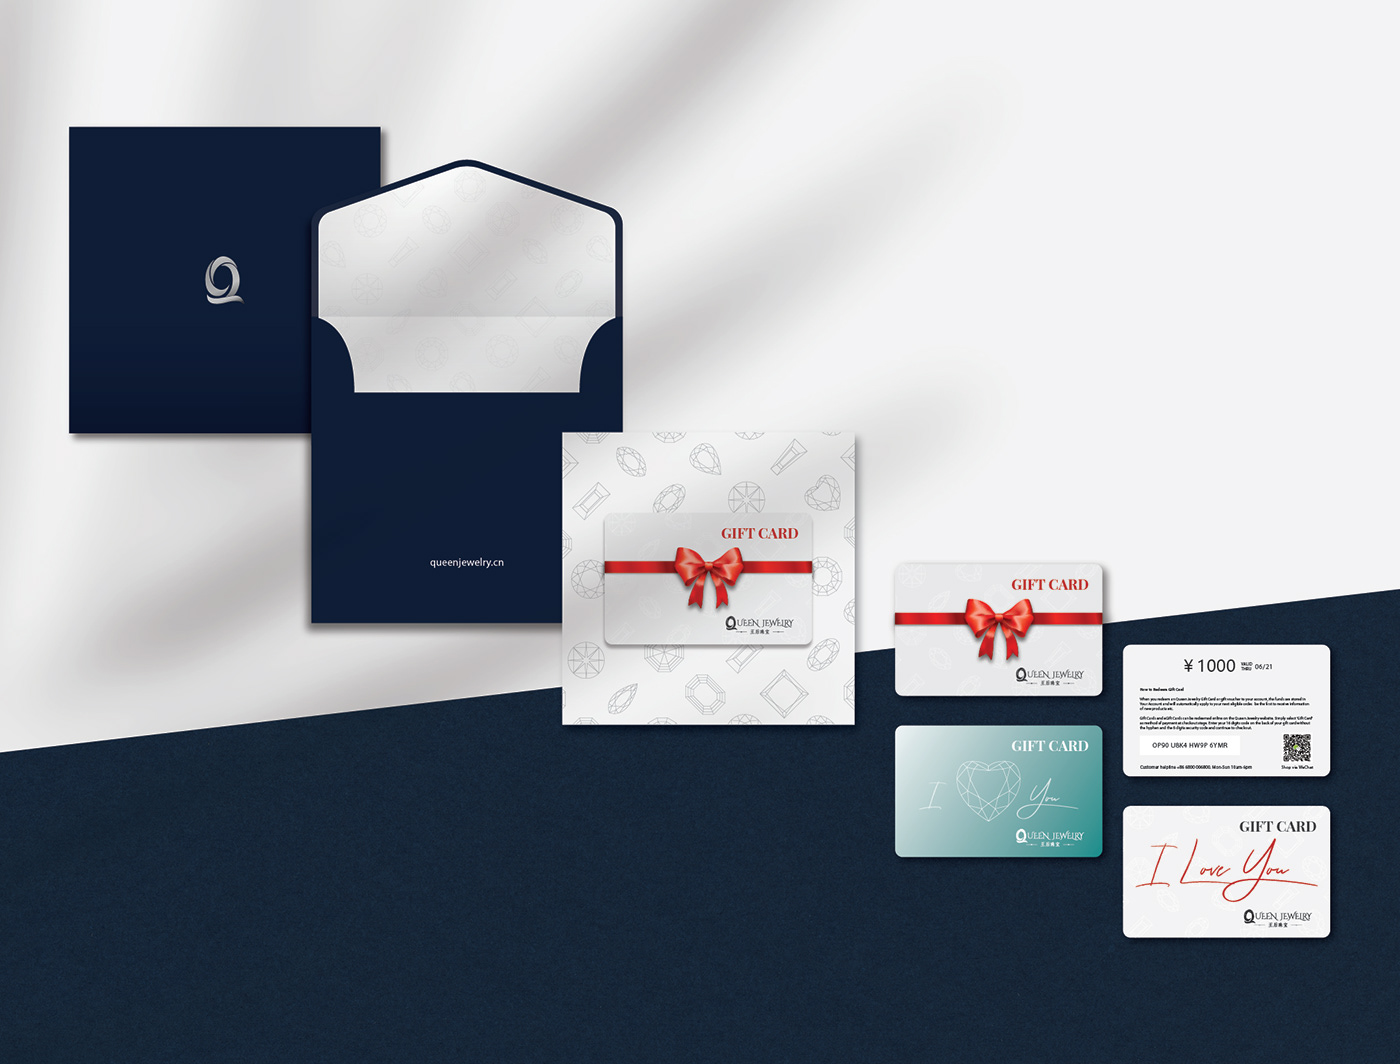 branding  Invitation jewelry luxury Product Photography Stationery visual identity Web Design